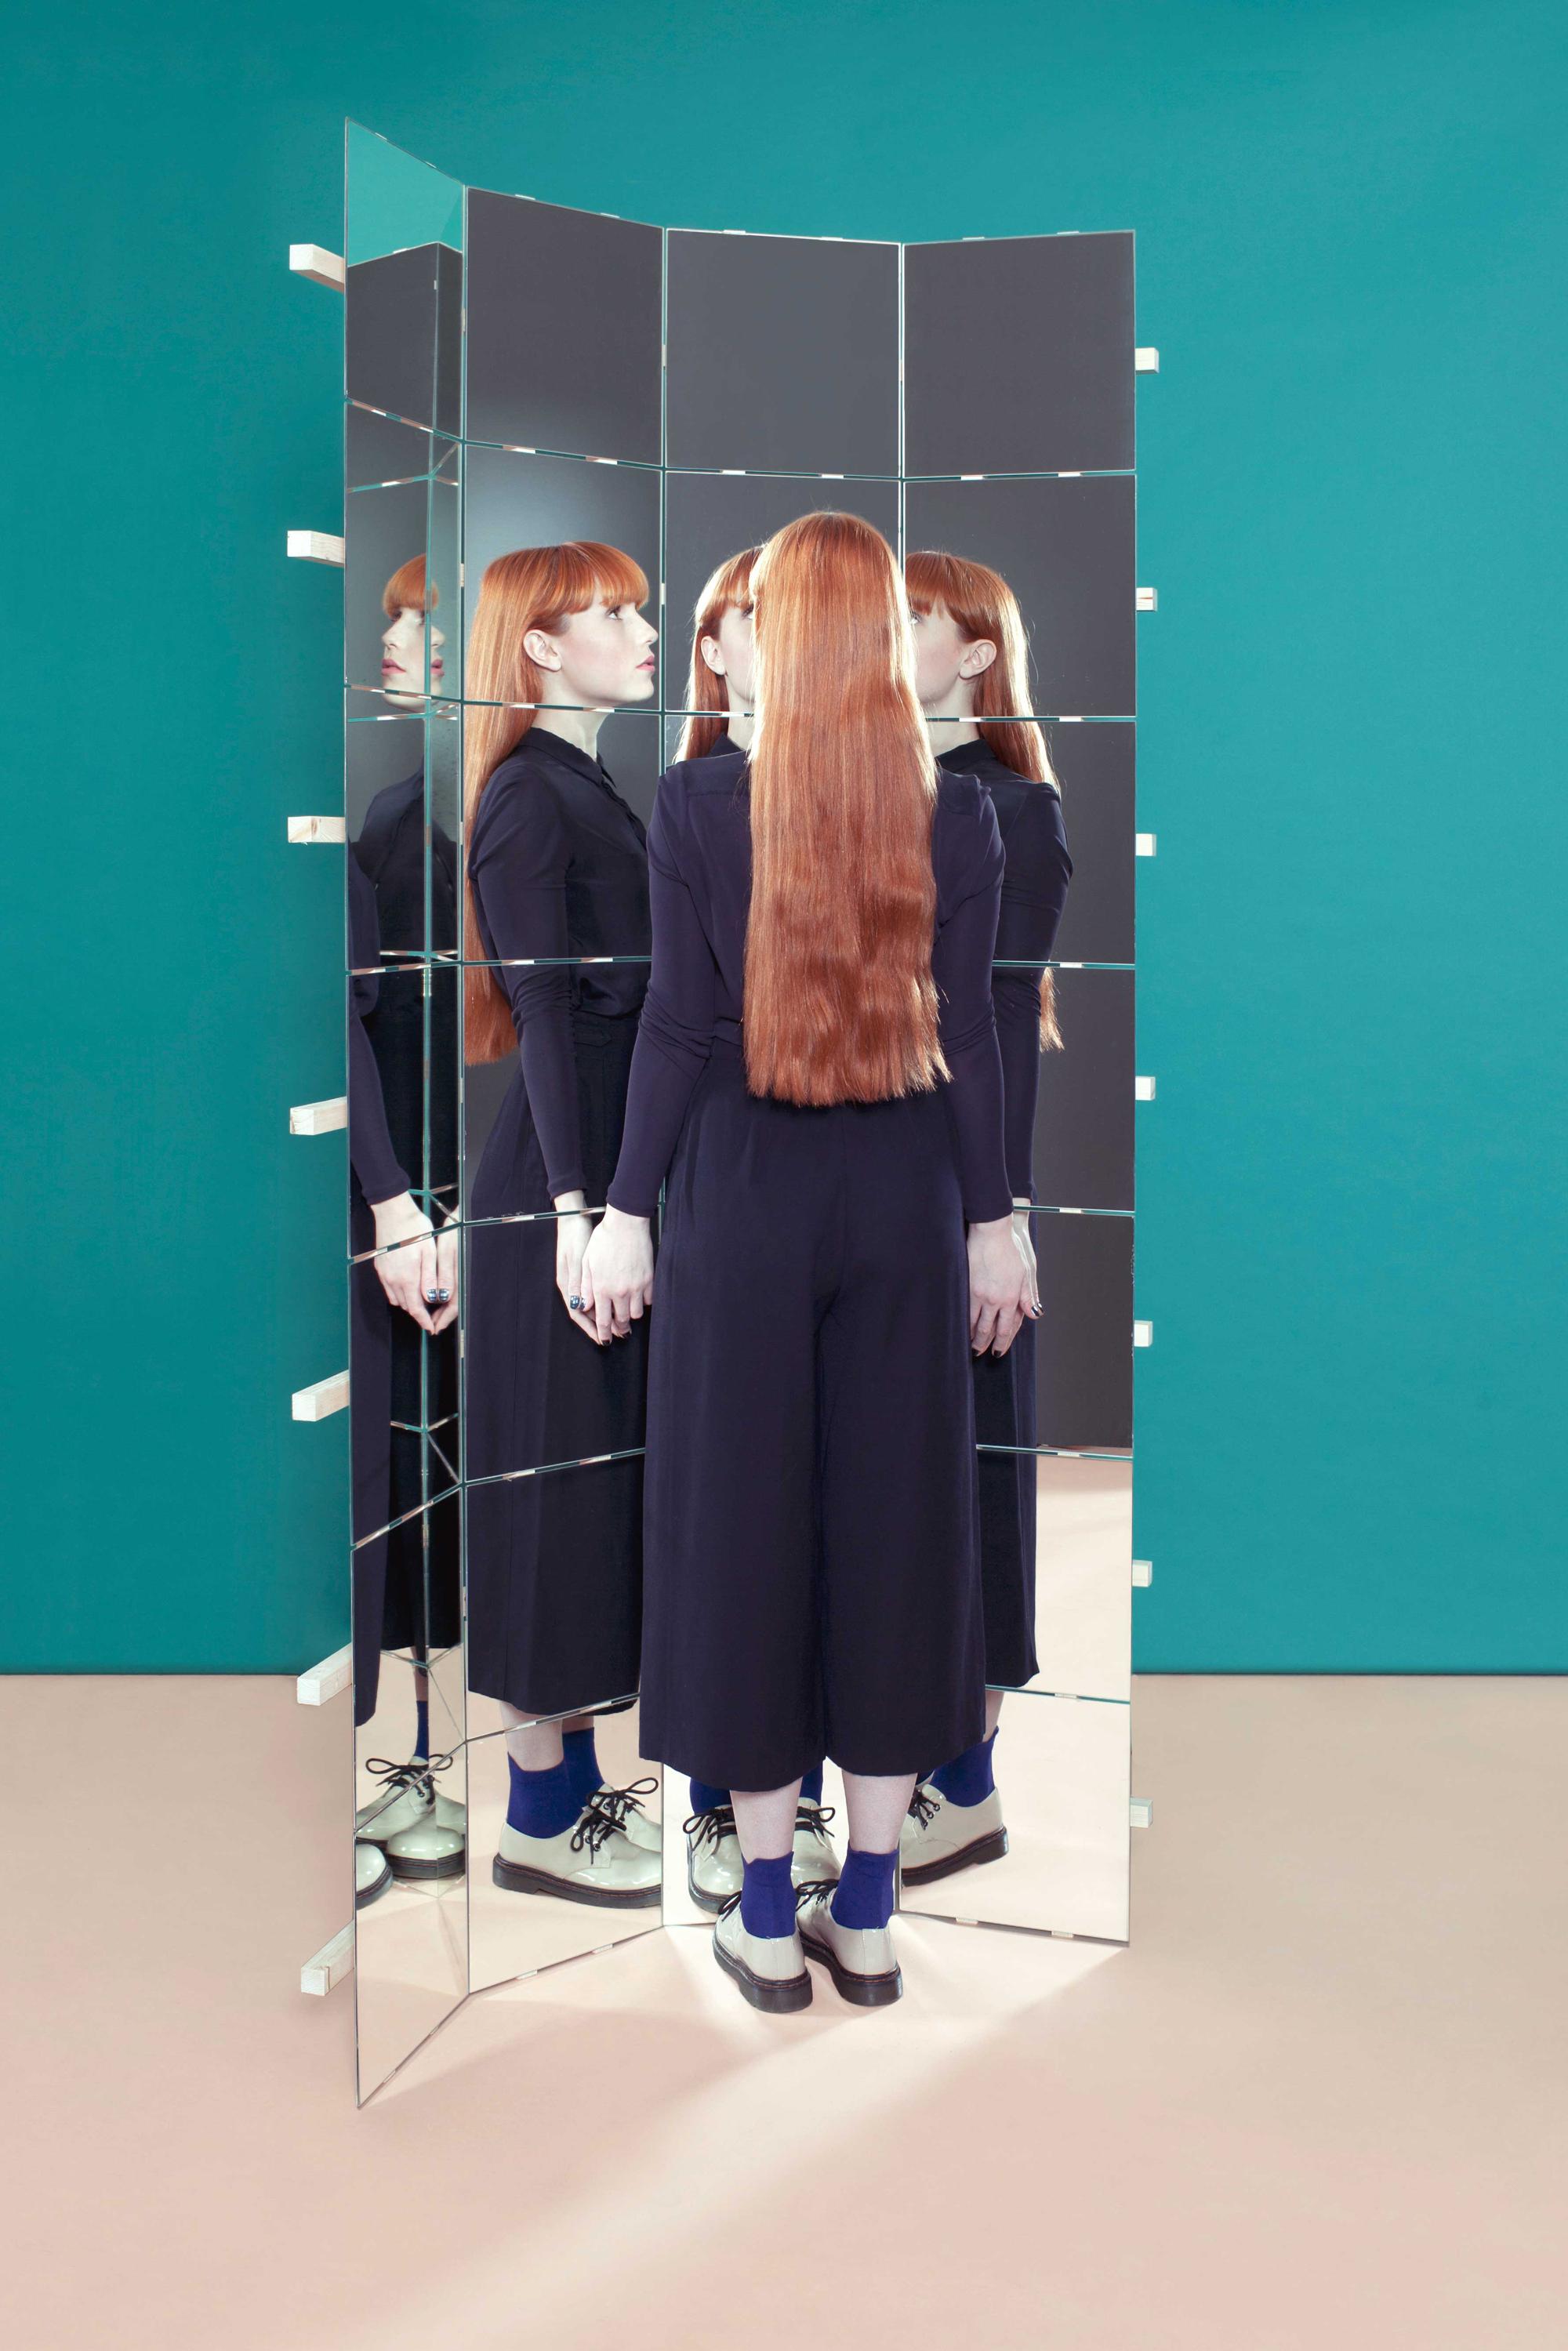 Mirror Image Supersized